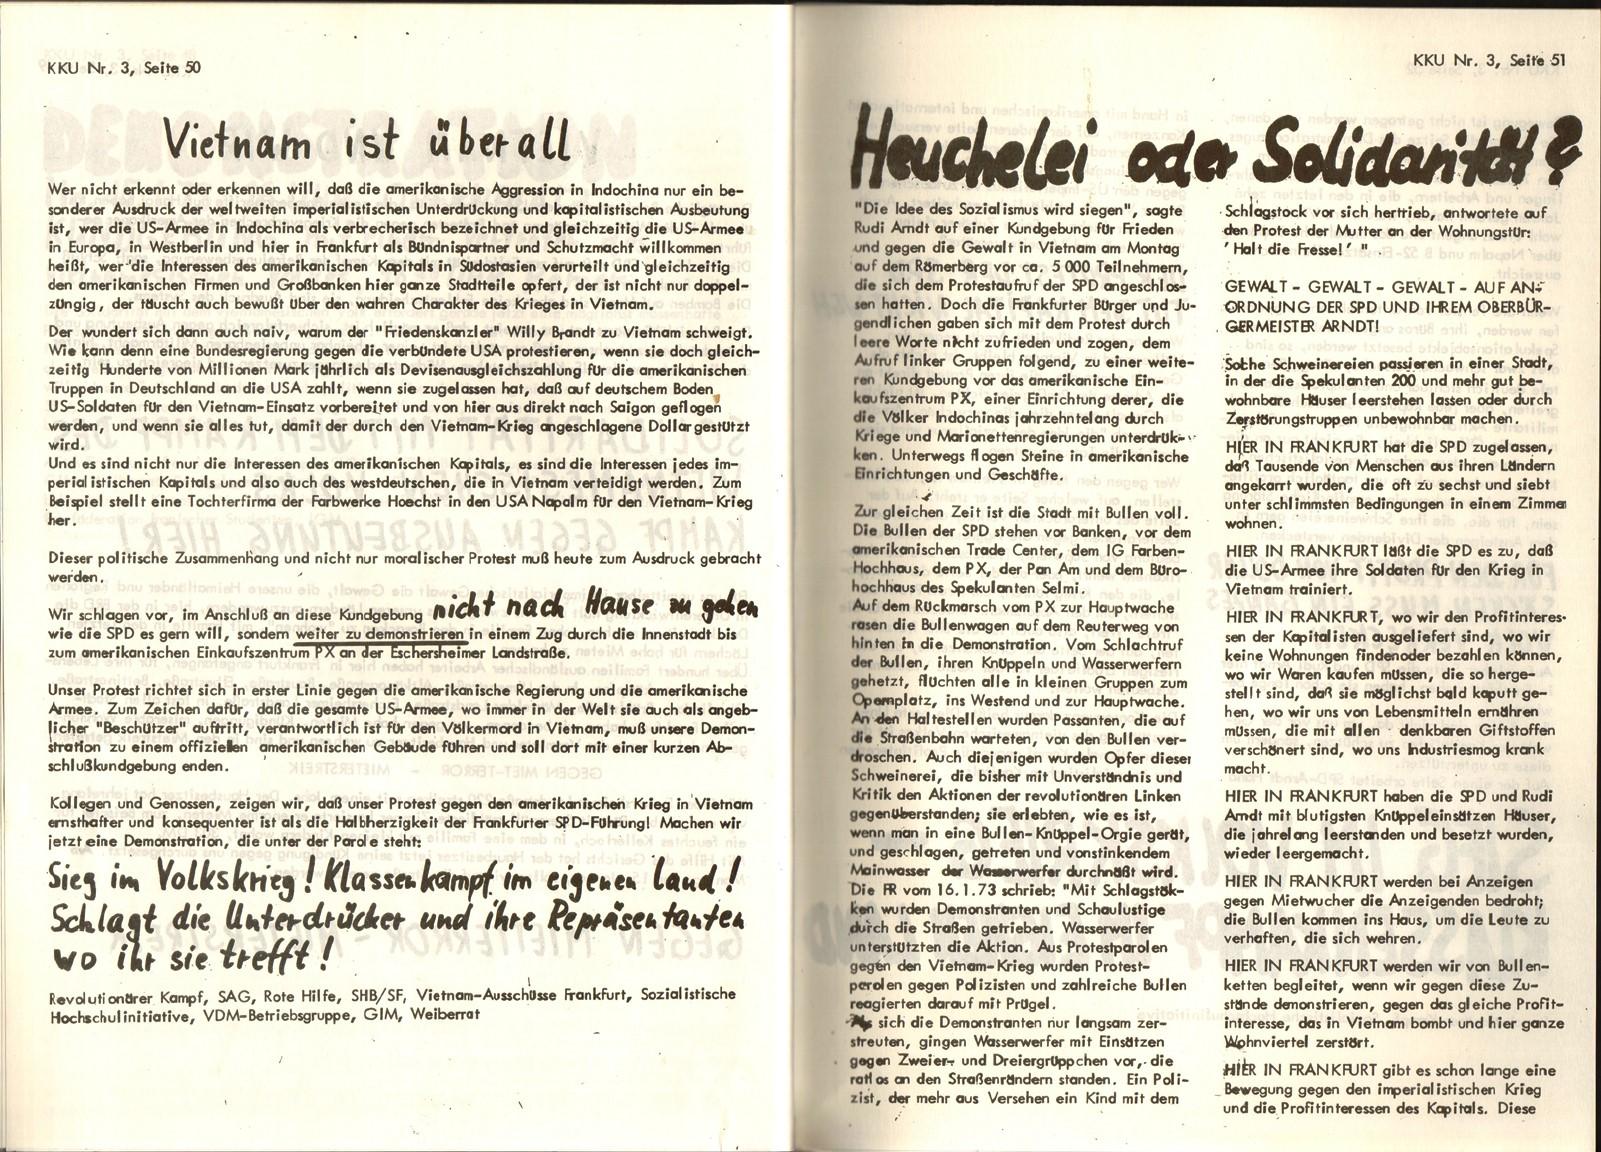 Frankfurt_Offenbach_KG_Kampf_Kritik_Umgestaltung_1973_03_27